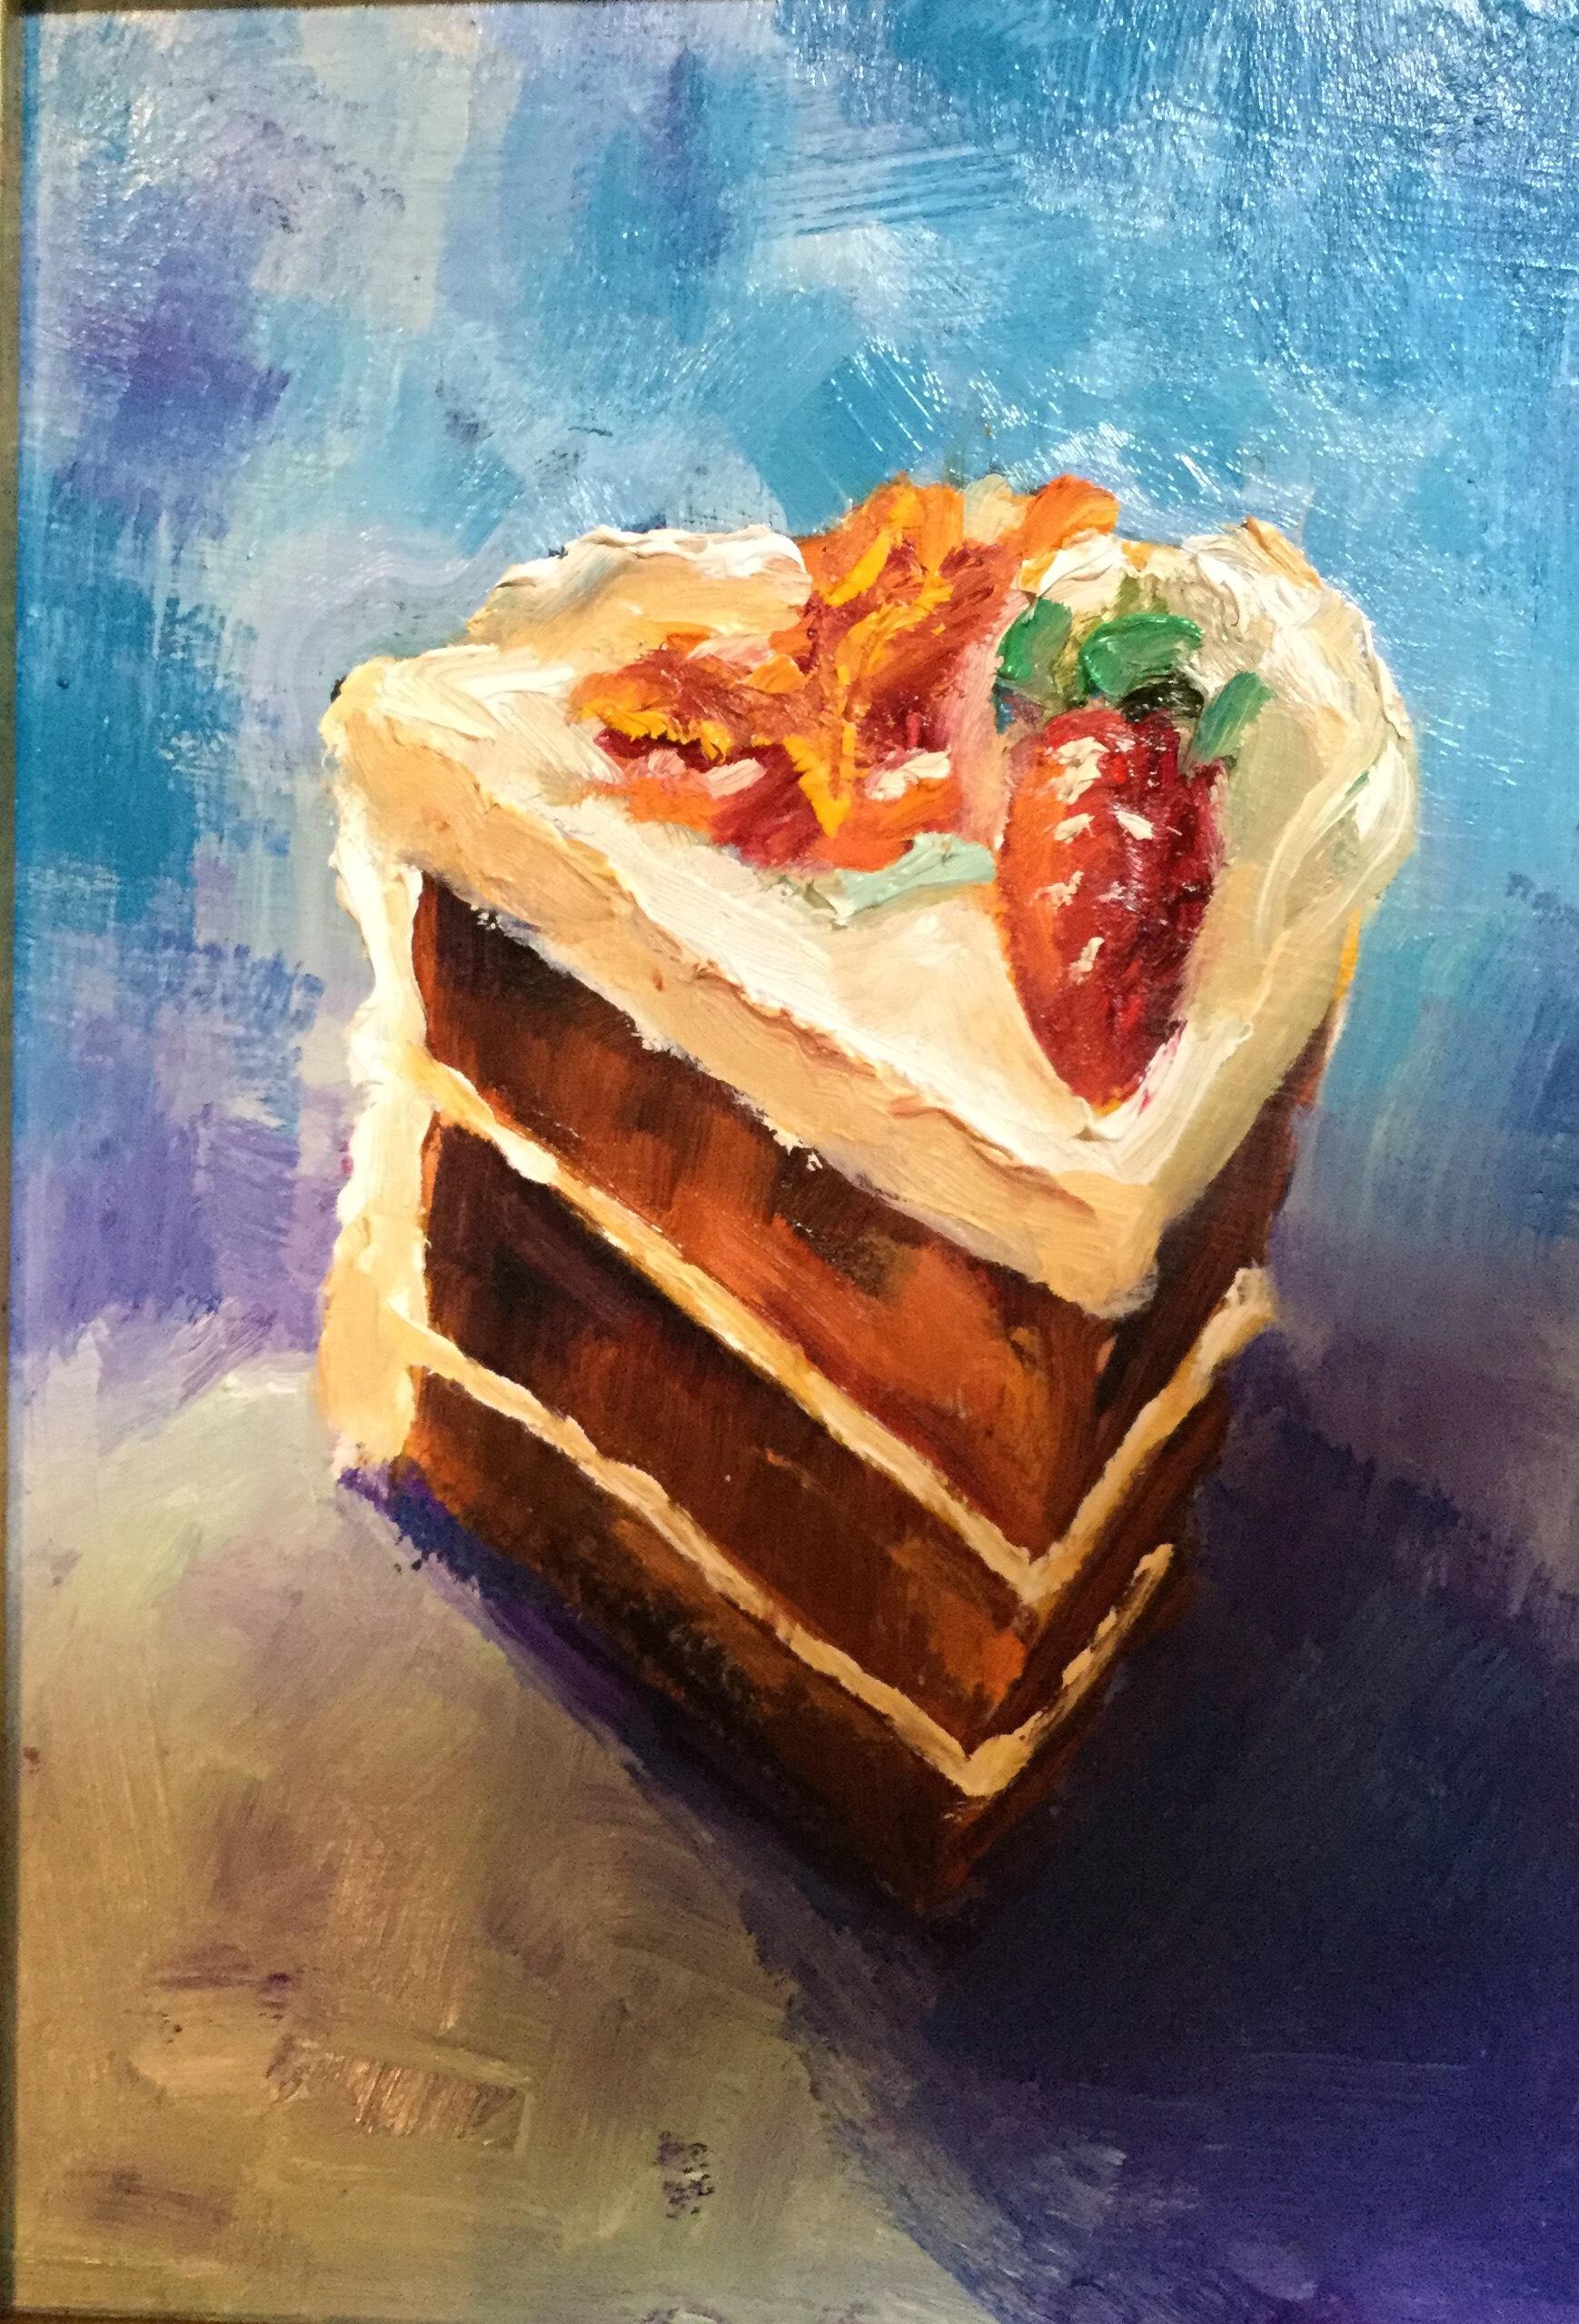 Carrot Cake 3 layers 5x7